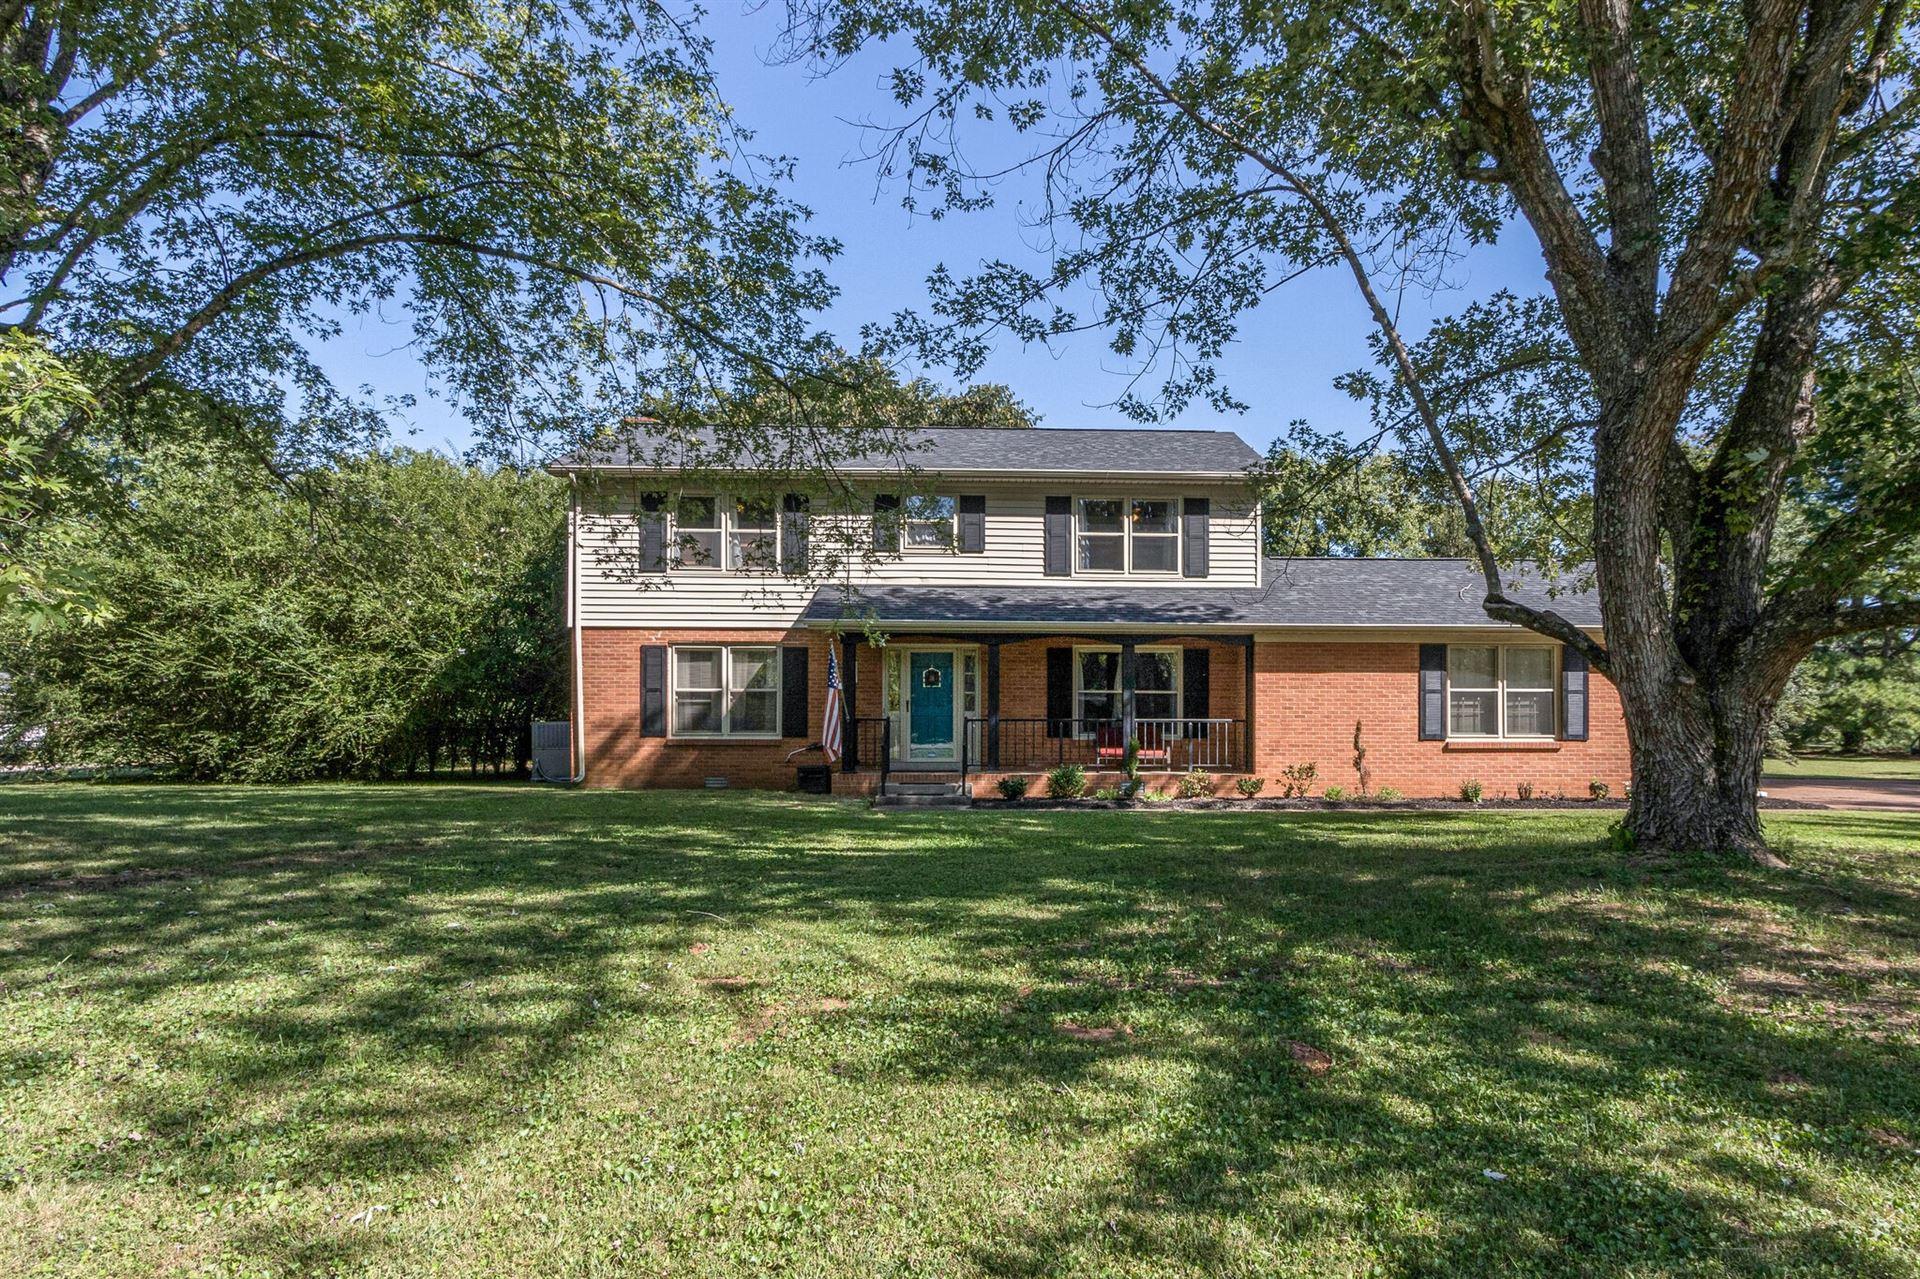 275 McKaig Rd, Murfreesboro, TN 37127 - MLS#: 2191983